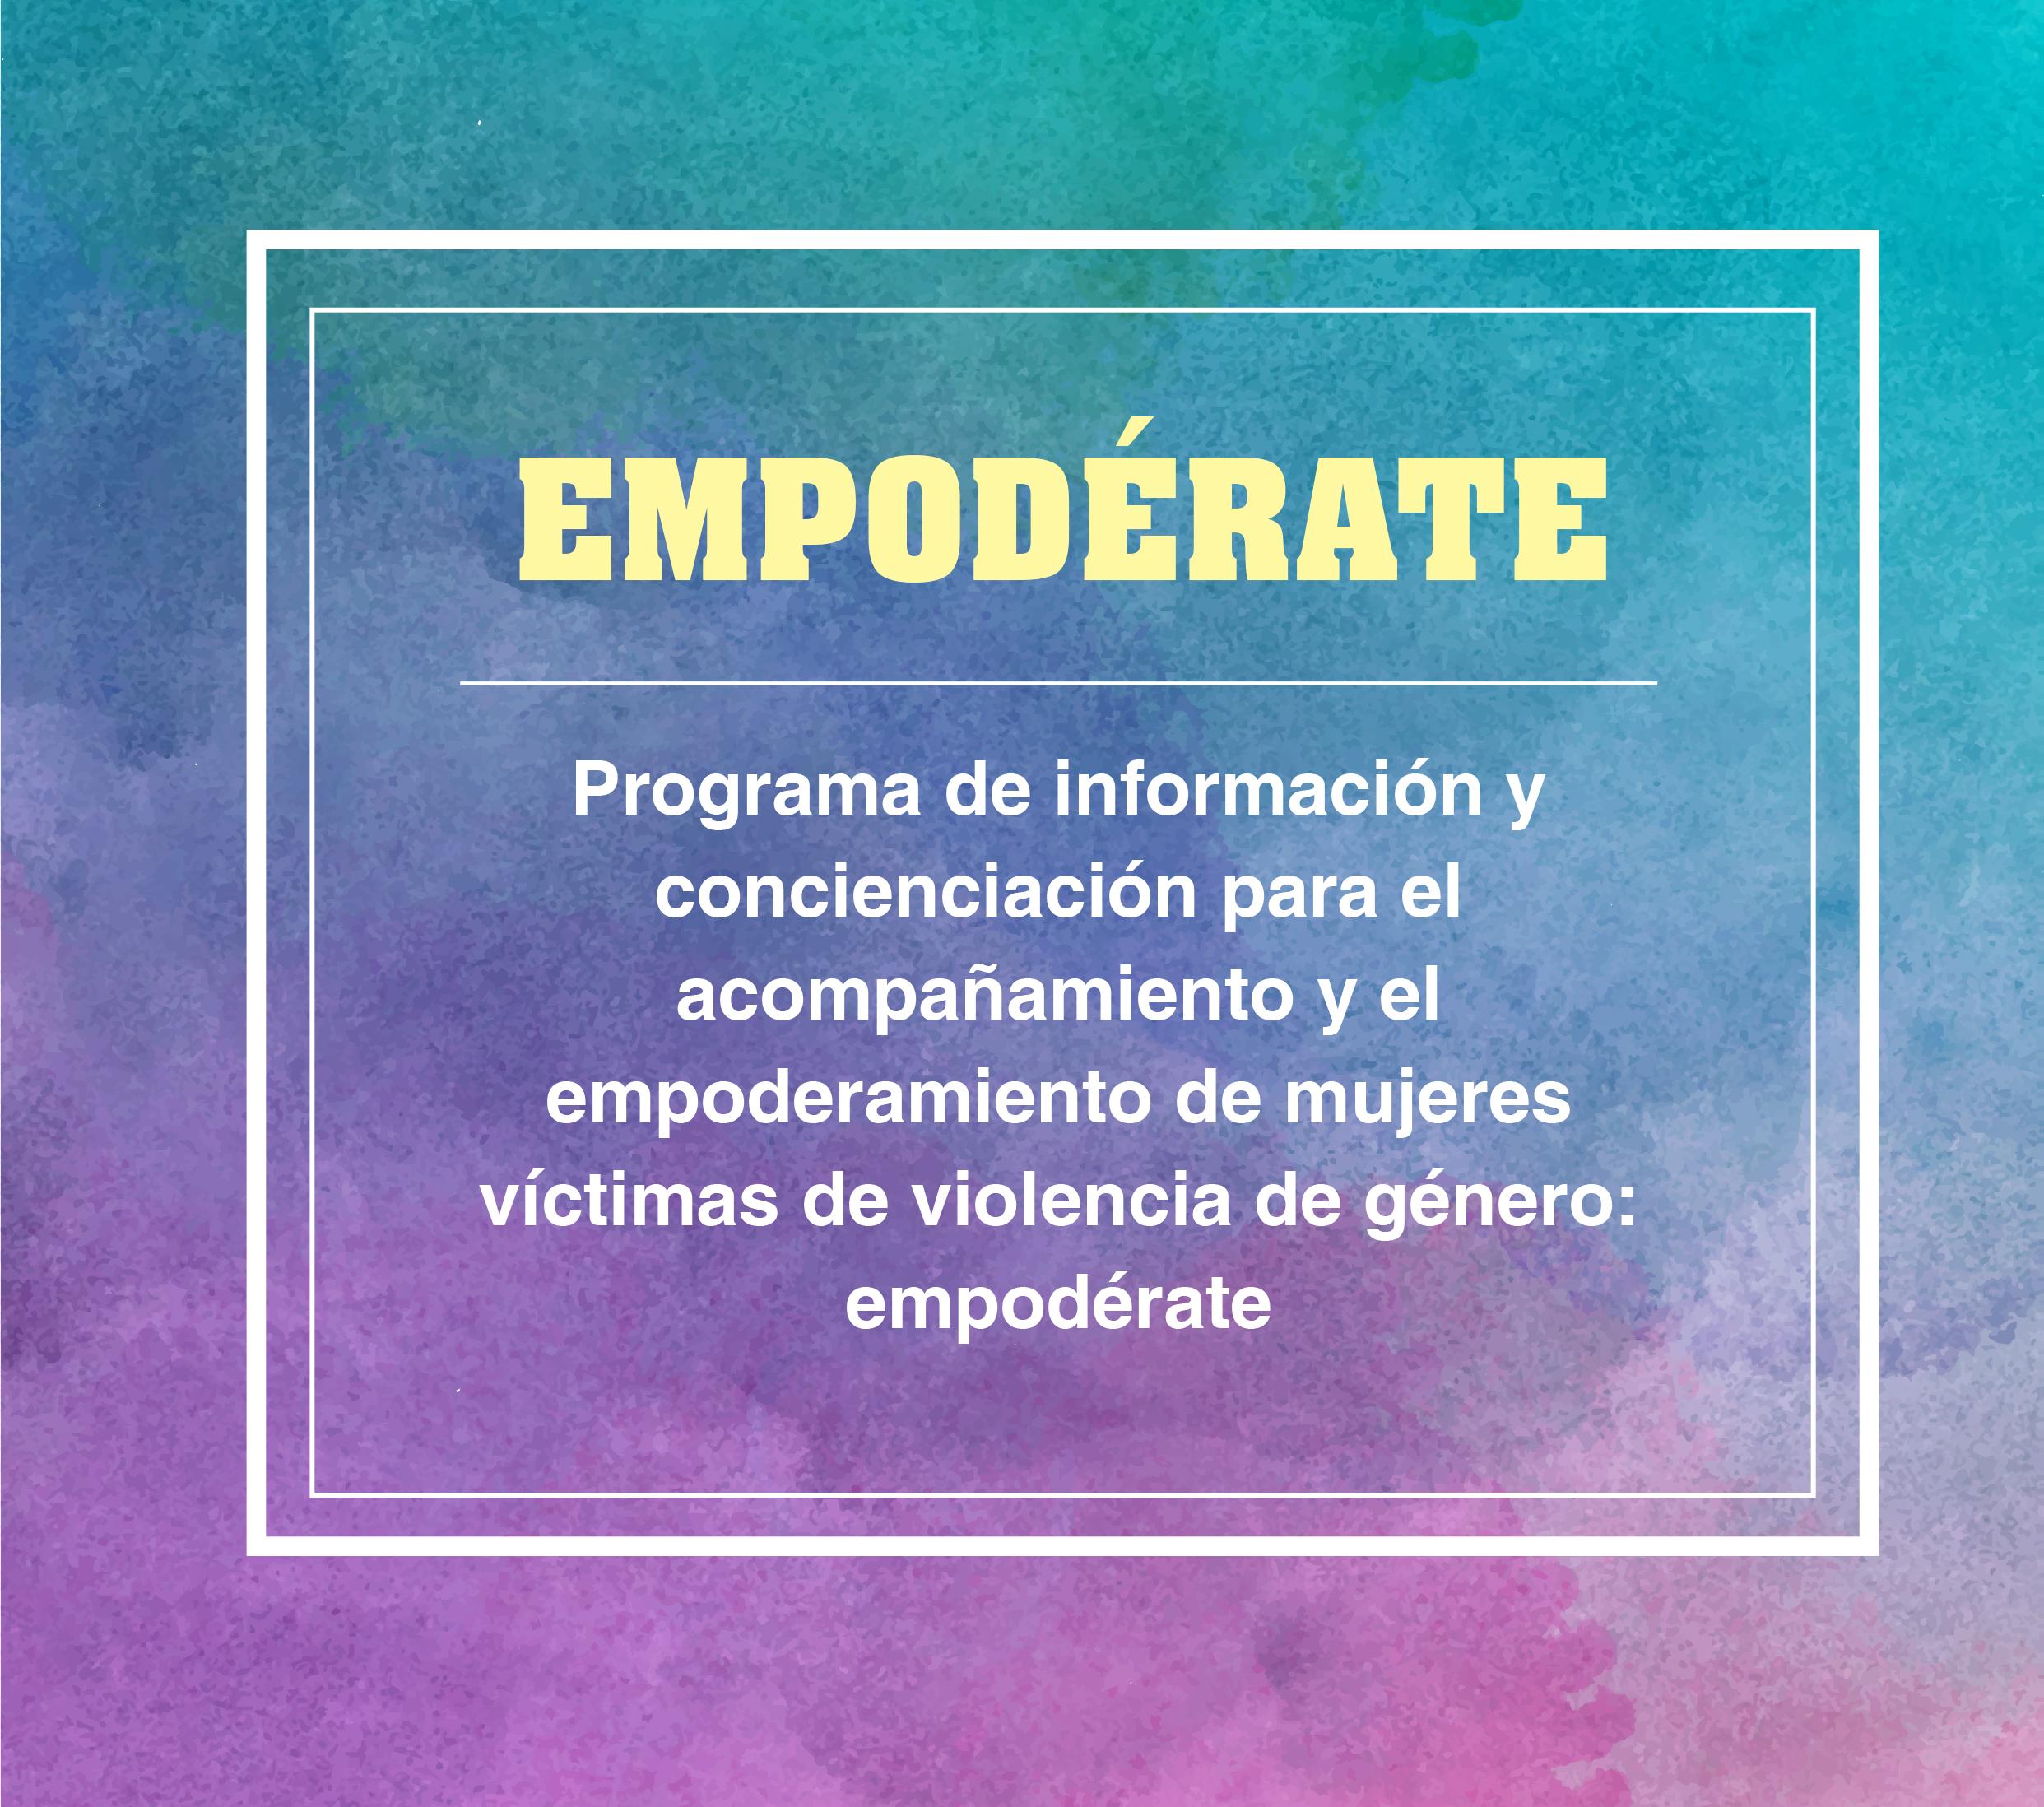 Course Image Formación específica de voluntariado. Proyecto Empodérate.